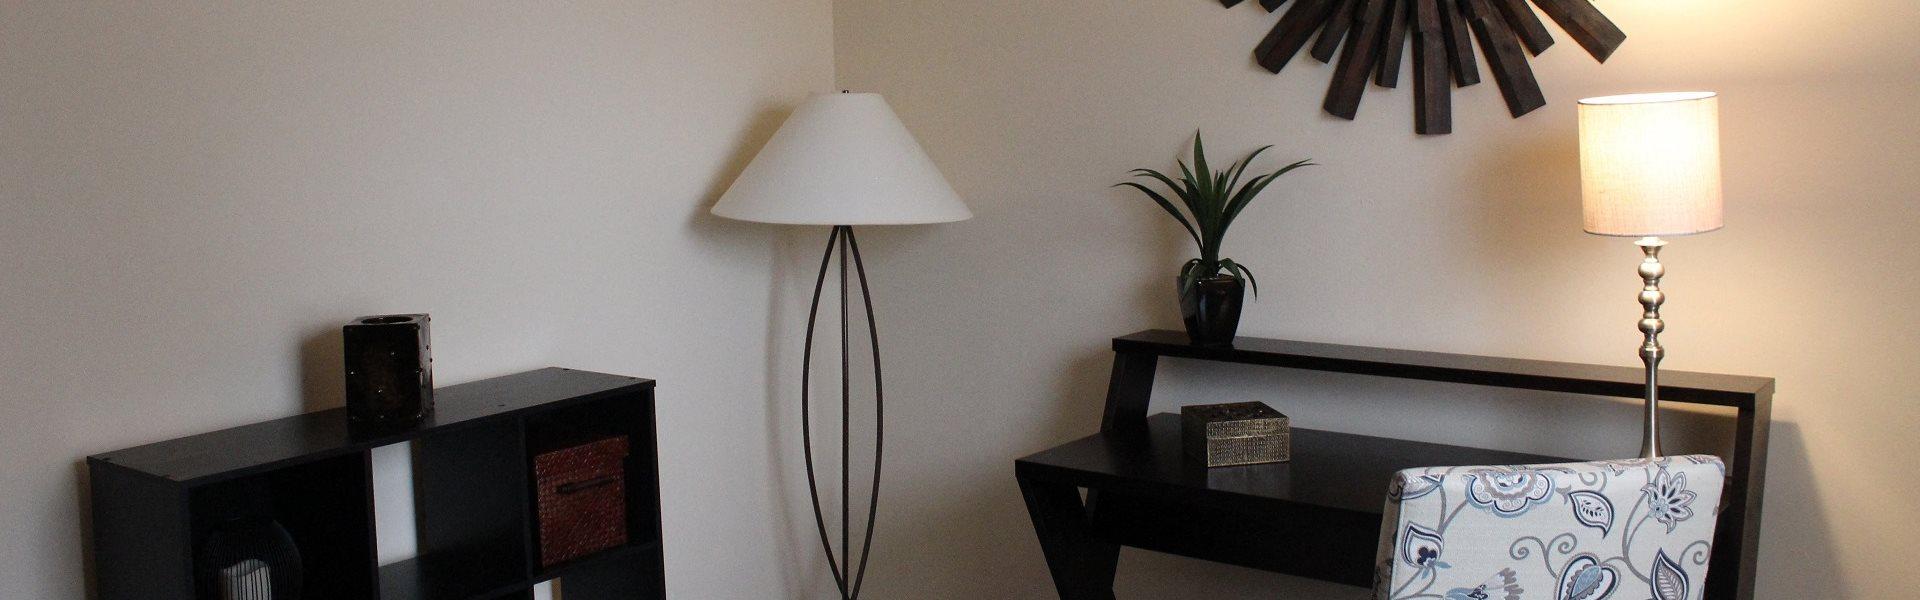 Sister Properties | Greenmar Apartments in Fenton, MO